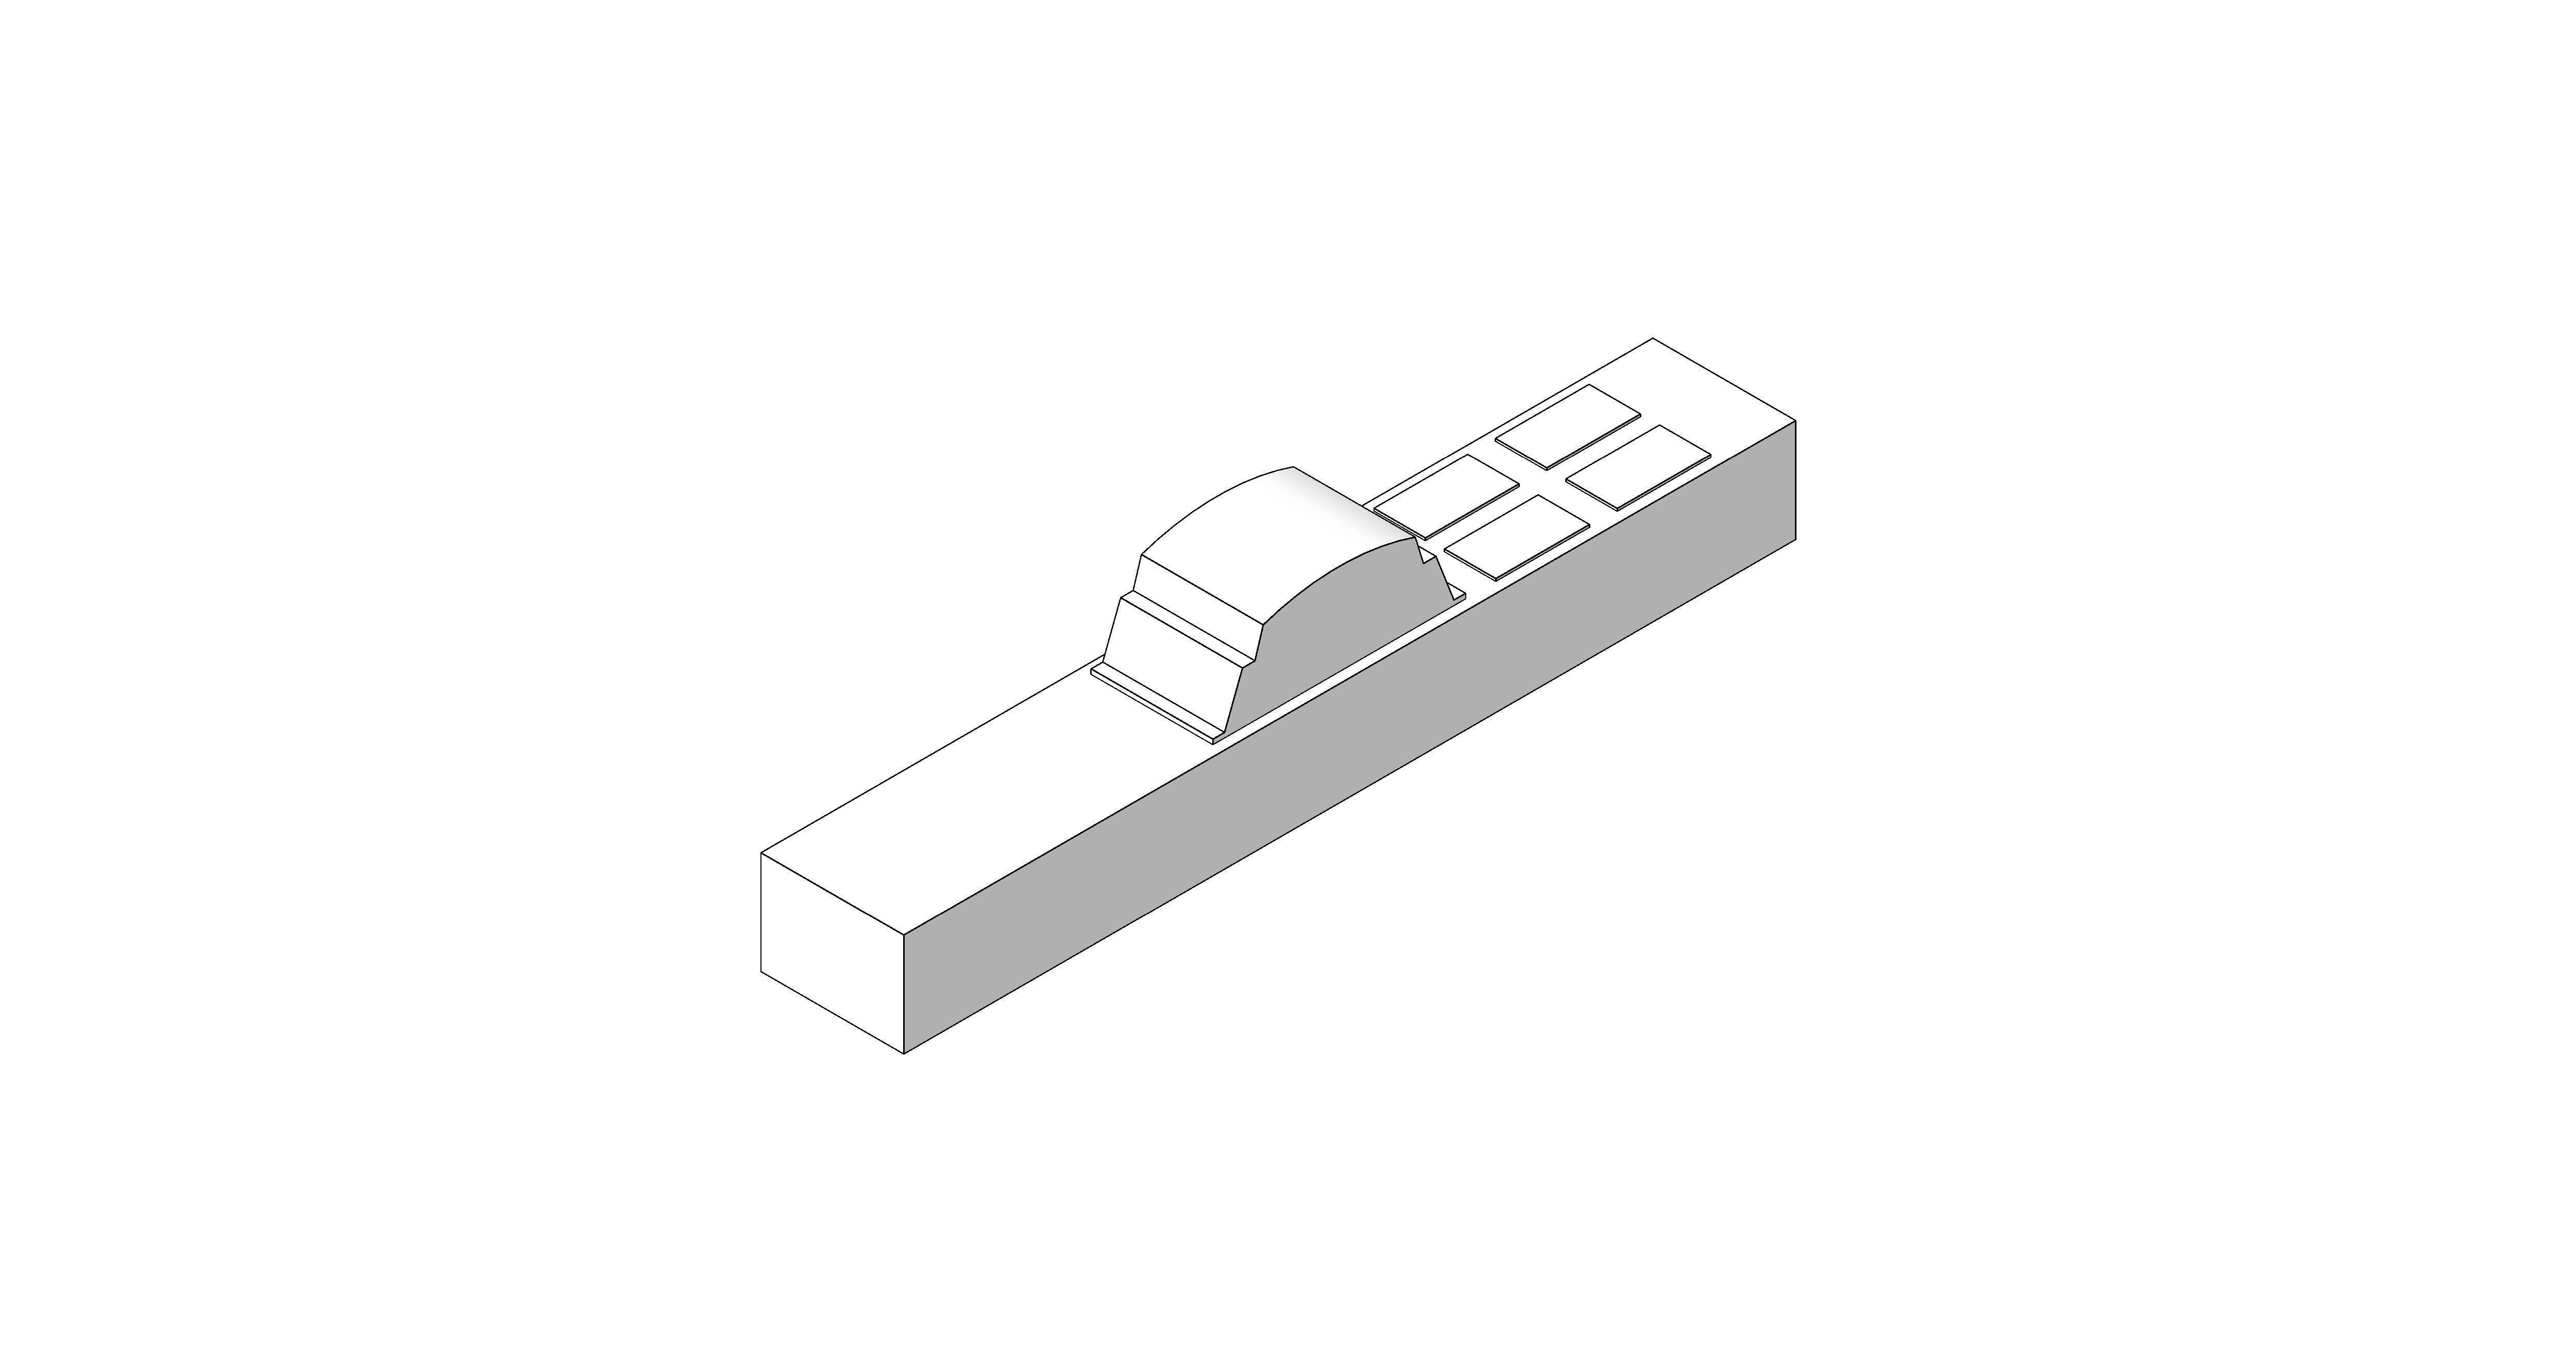 Product: Desk Module - 4 Way - RCBO